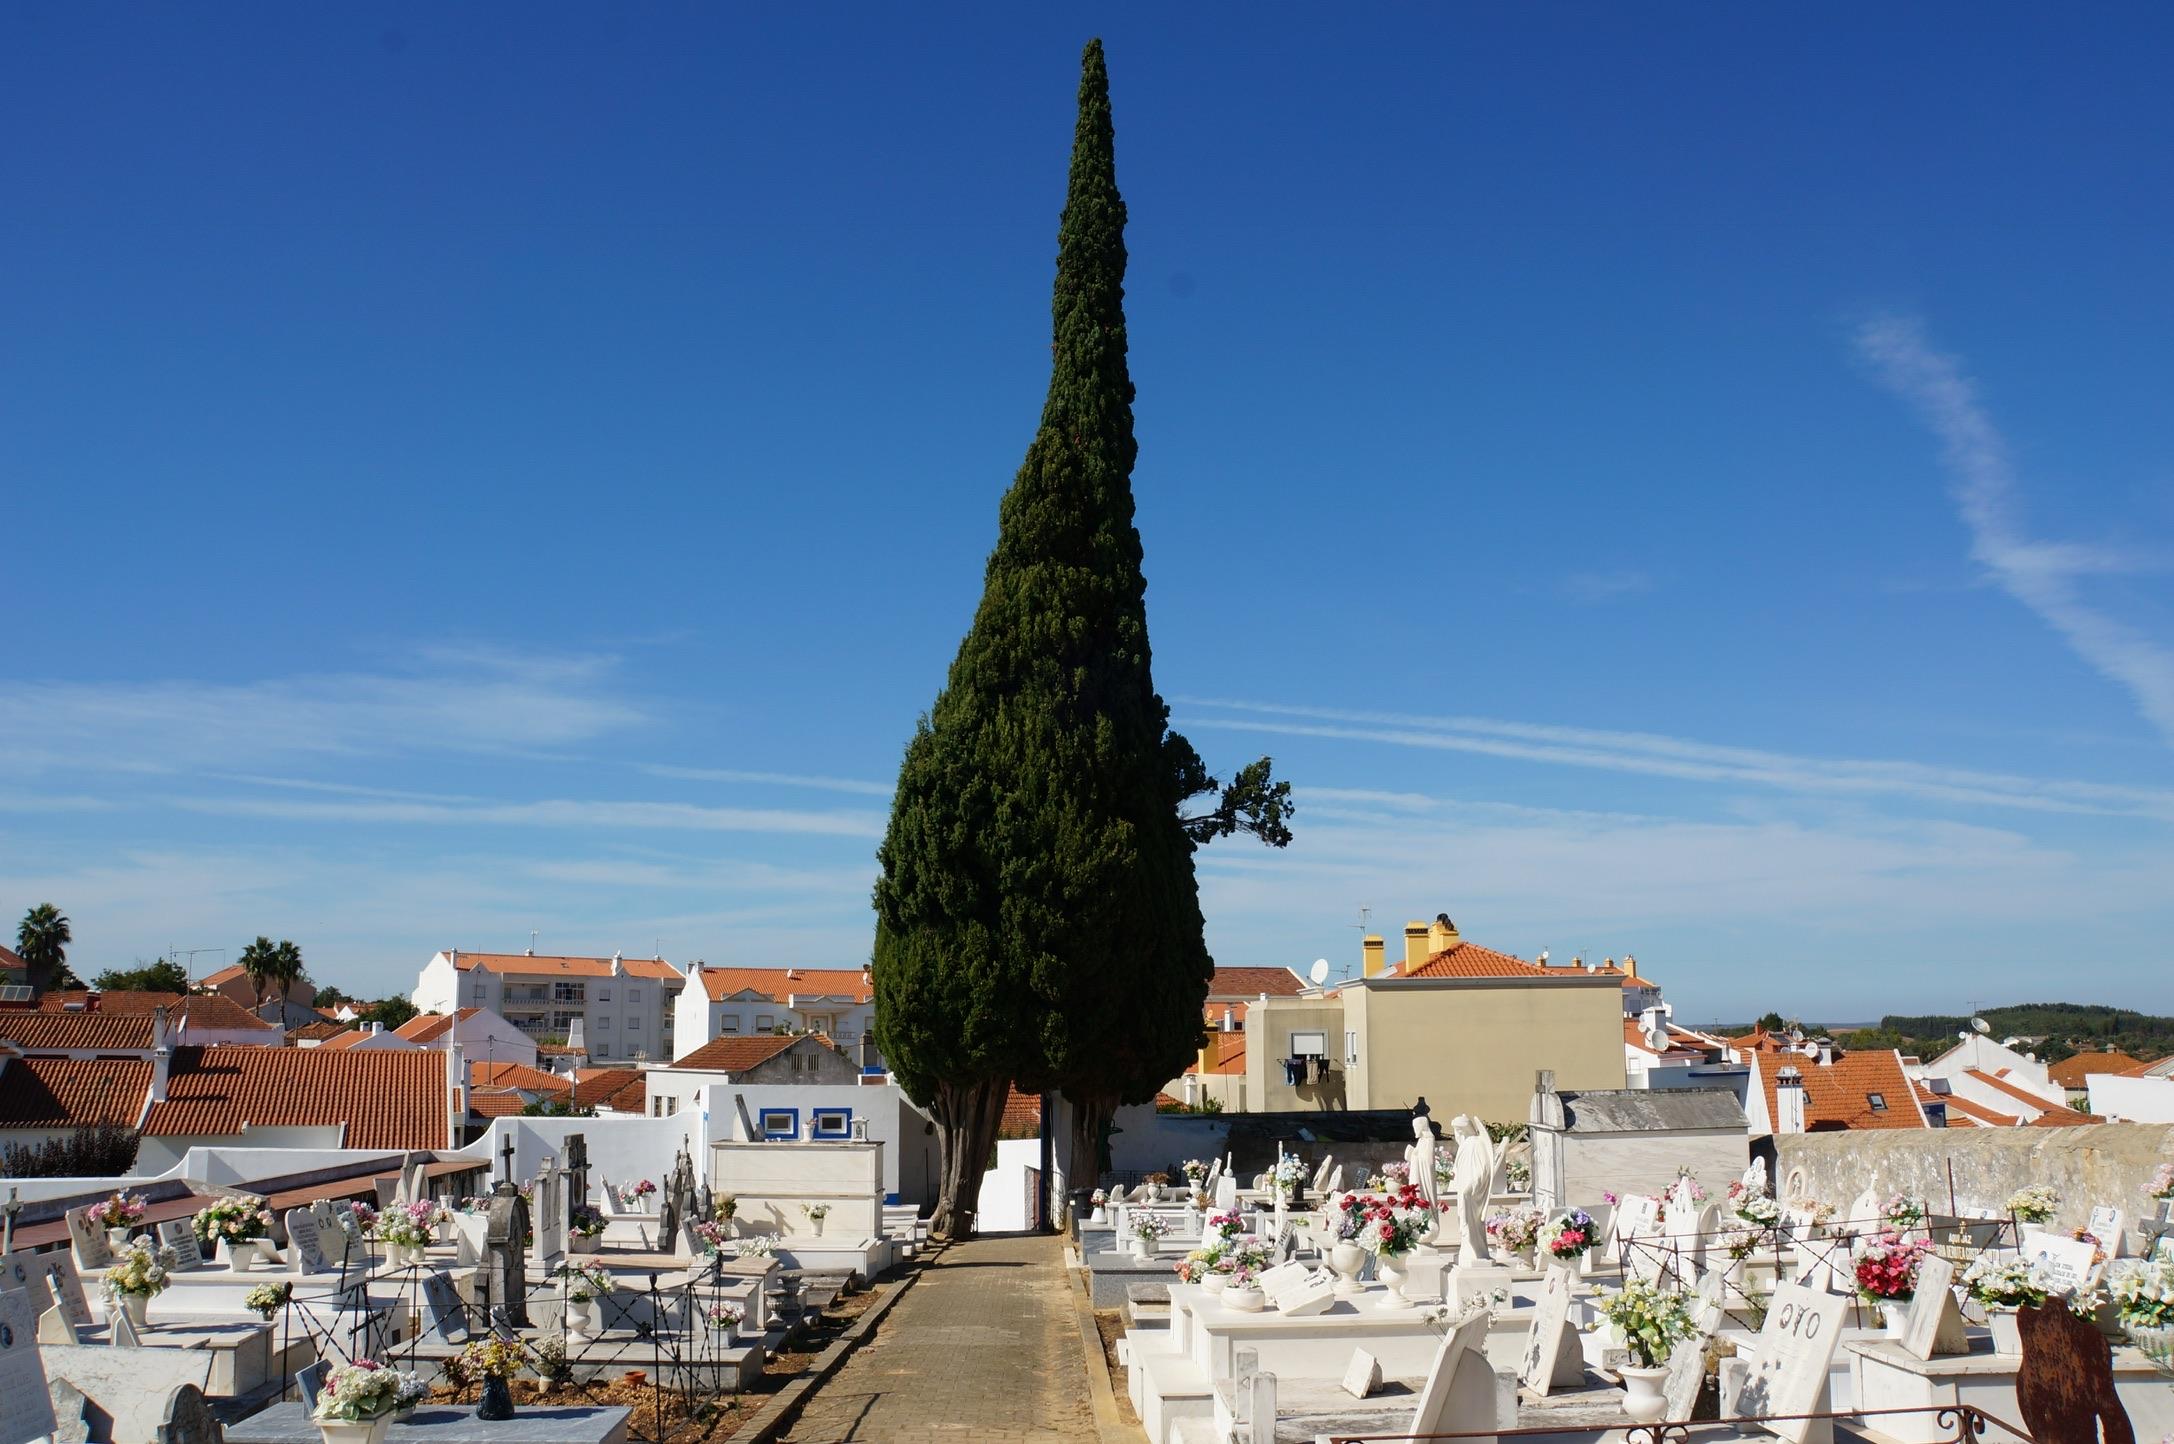 Foto Ra Van Der Hoek | Oktober 2016 | Cercal Portugal